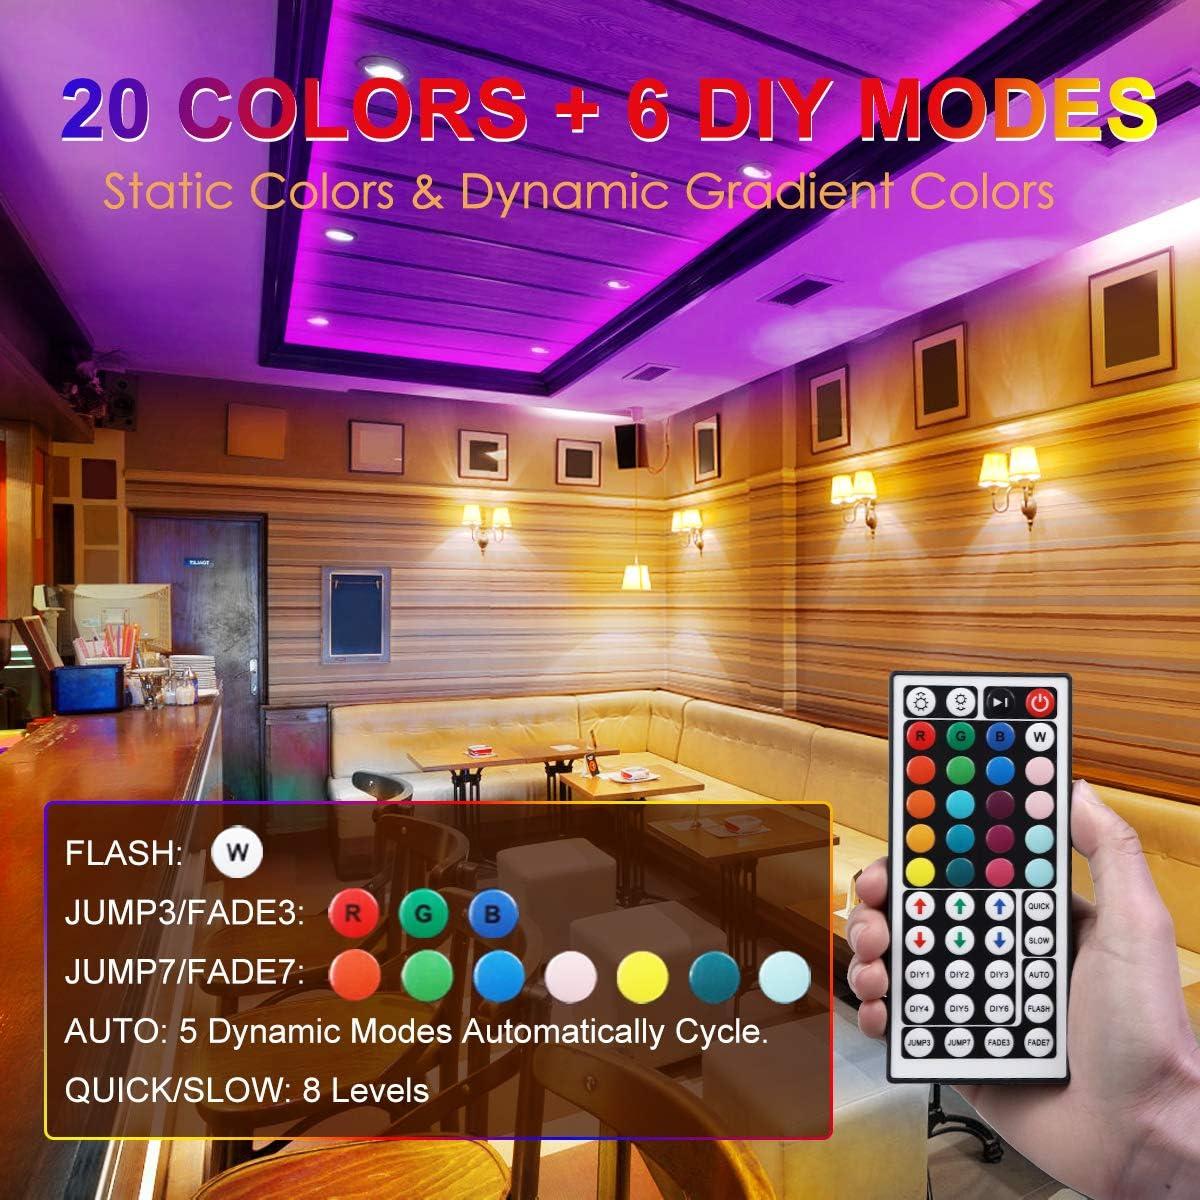 Tiras LED 10M (5M*2), IP67 Impermeable Luces LED Decoracion Habitacion, 5050 RGB 300 LEDs, 20 Colores, 6 Modos Dinámicos, Admite DIY, 12V DC Adaptador, Control Remoto de 44 Claves: Amazon.es: Iluminación